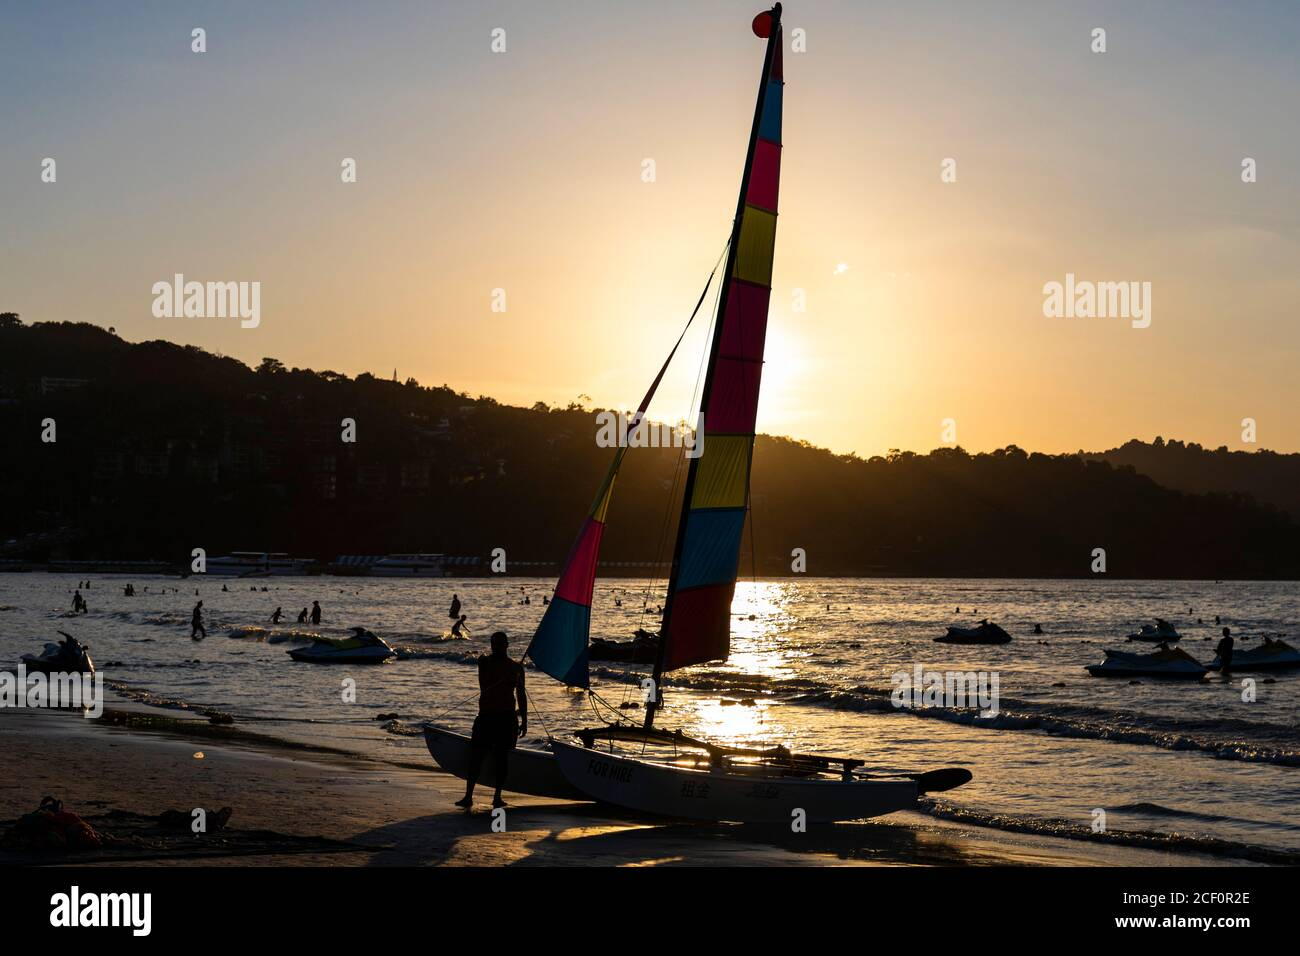 Barco de vela en alquiler en la playa de Patong al atardecer, Phuket, Tailandia Foto de stock